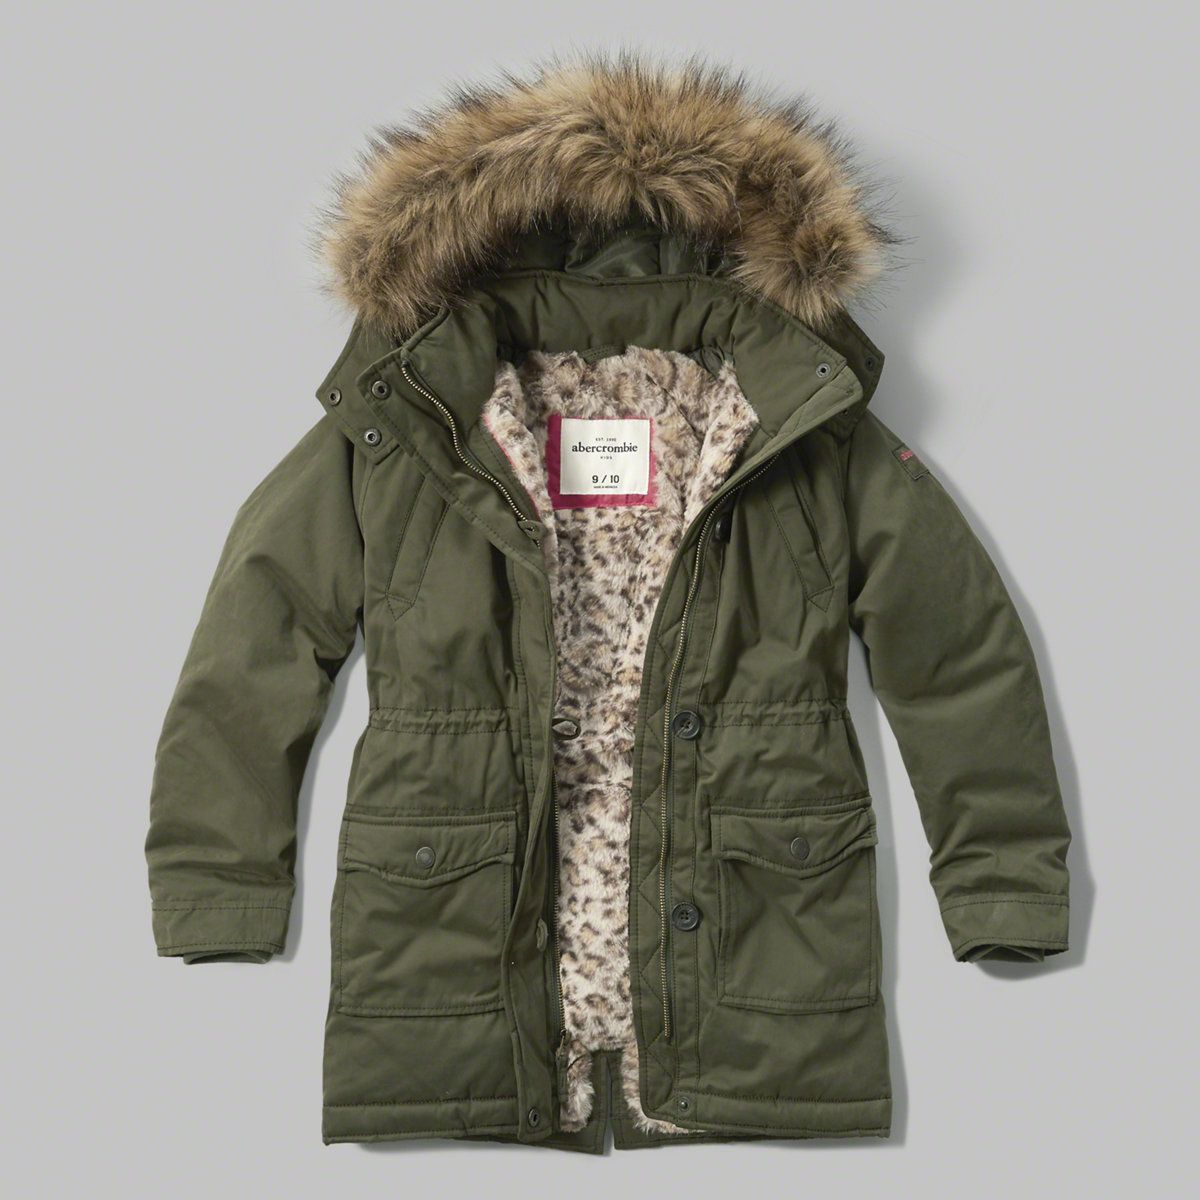 Faux Fur Lined Parka Outerwear Jackets Kids Outfits Green Winter Coat [ 1200 x 1200 Pixel ]